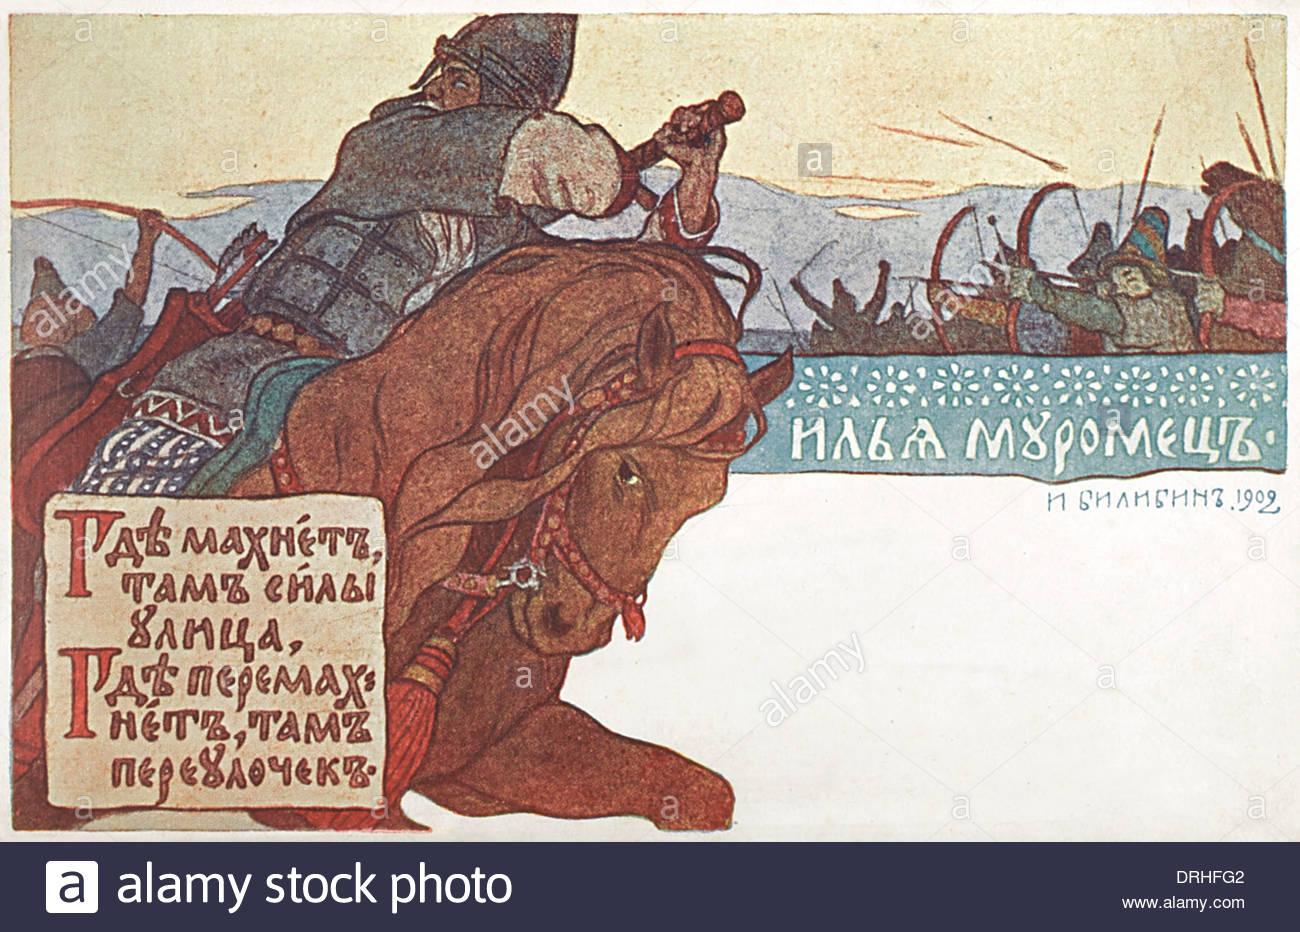 ilya-muromets-elijah-of-murom-on-horseback-drhfg2.jpg